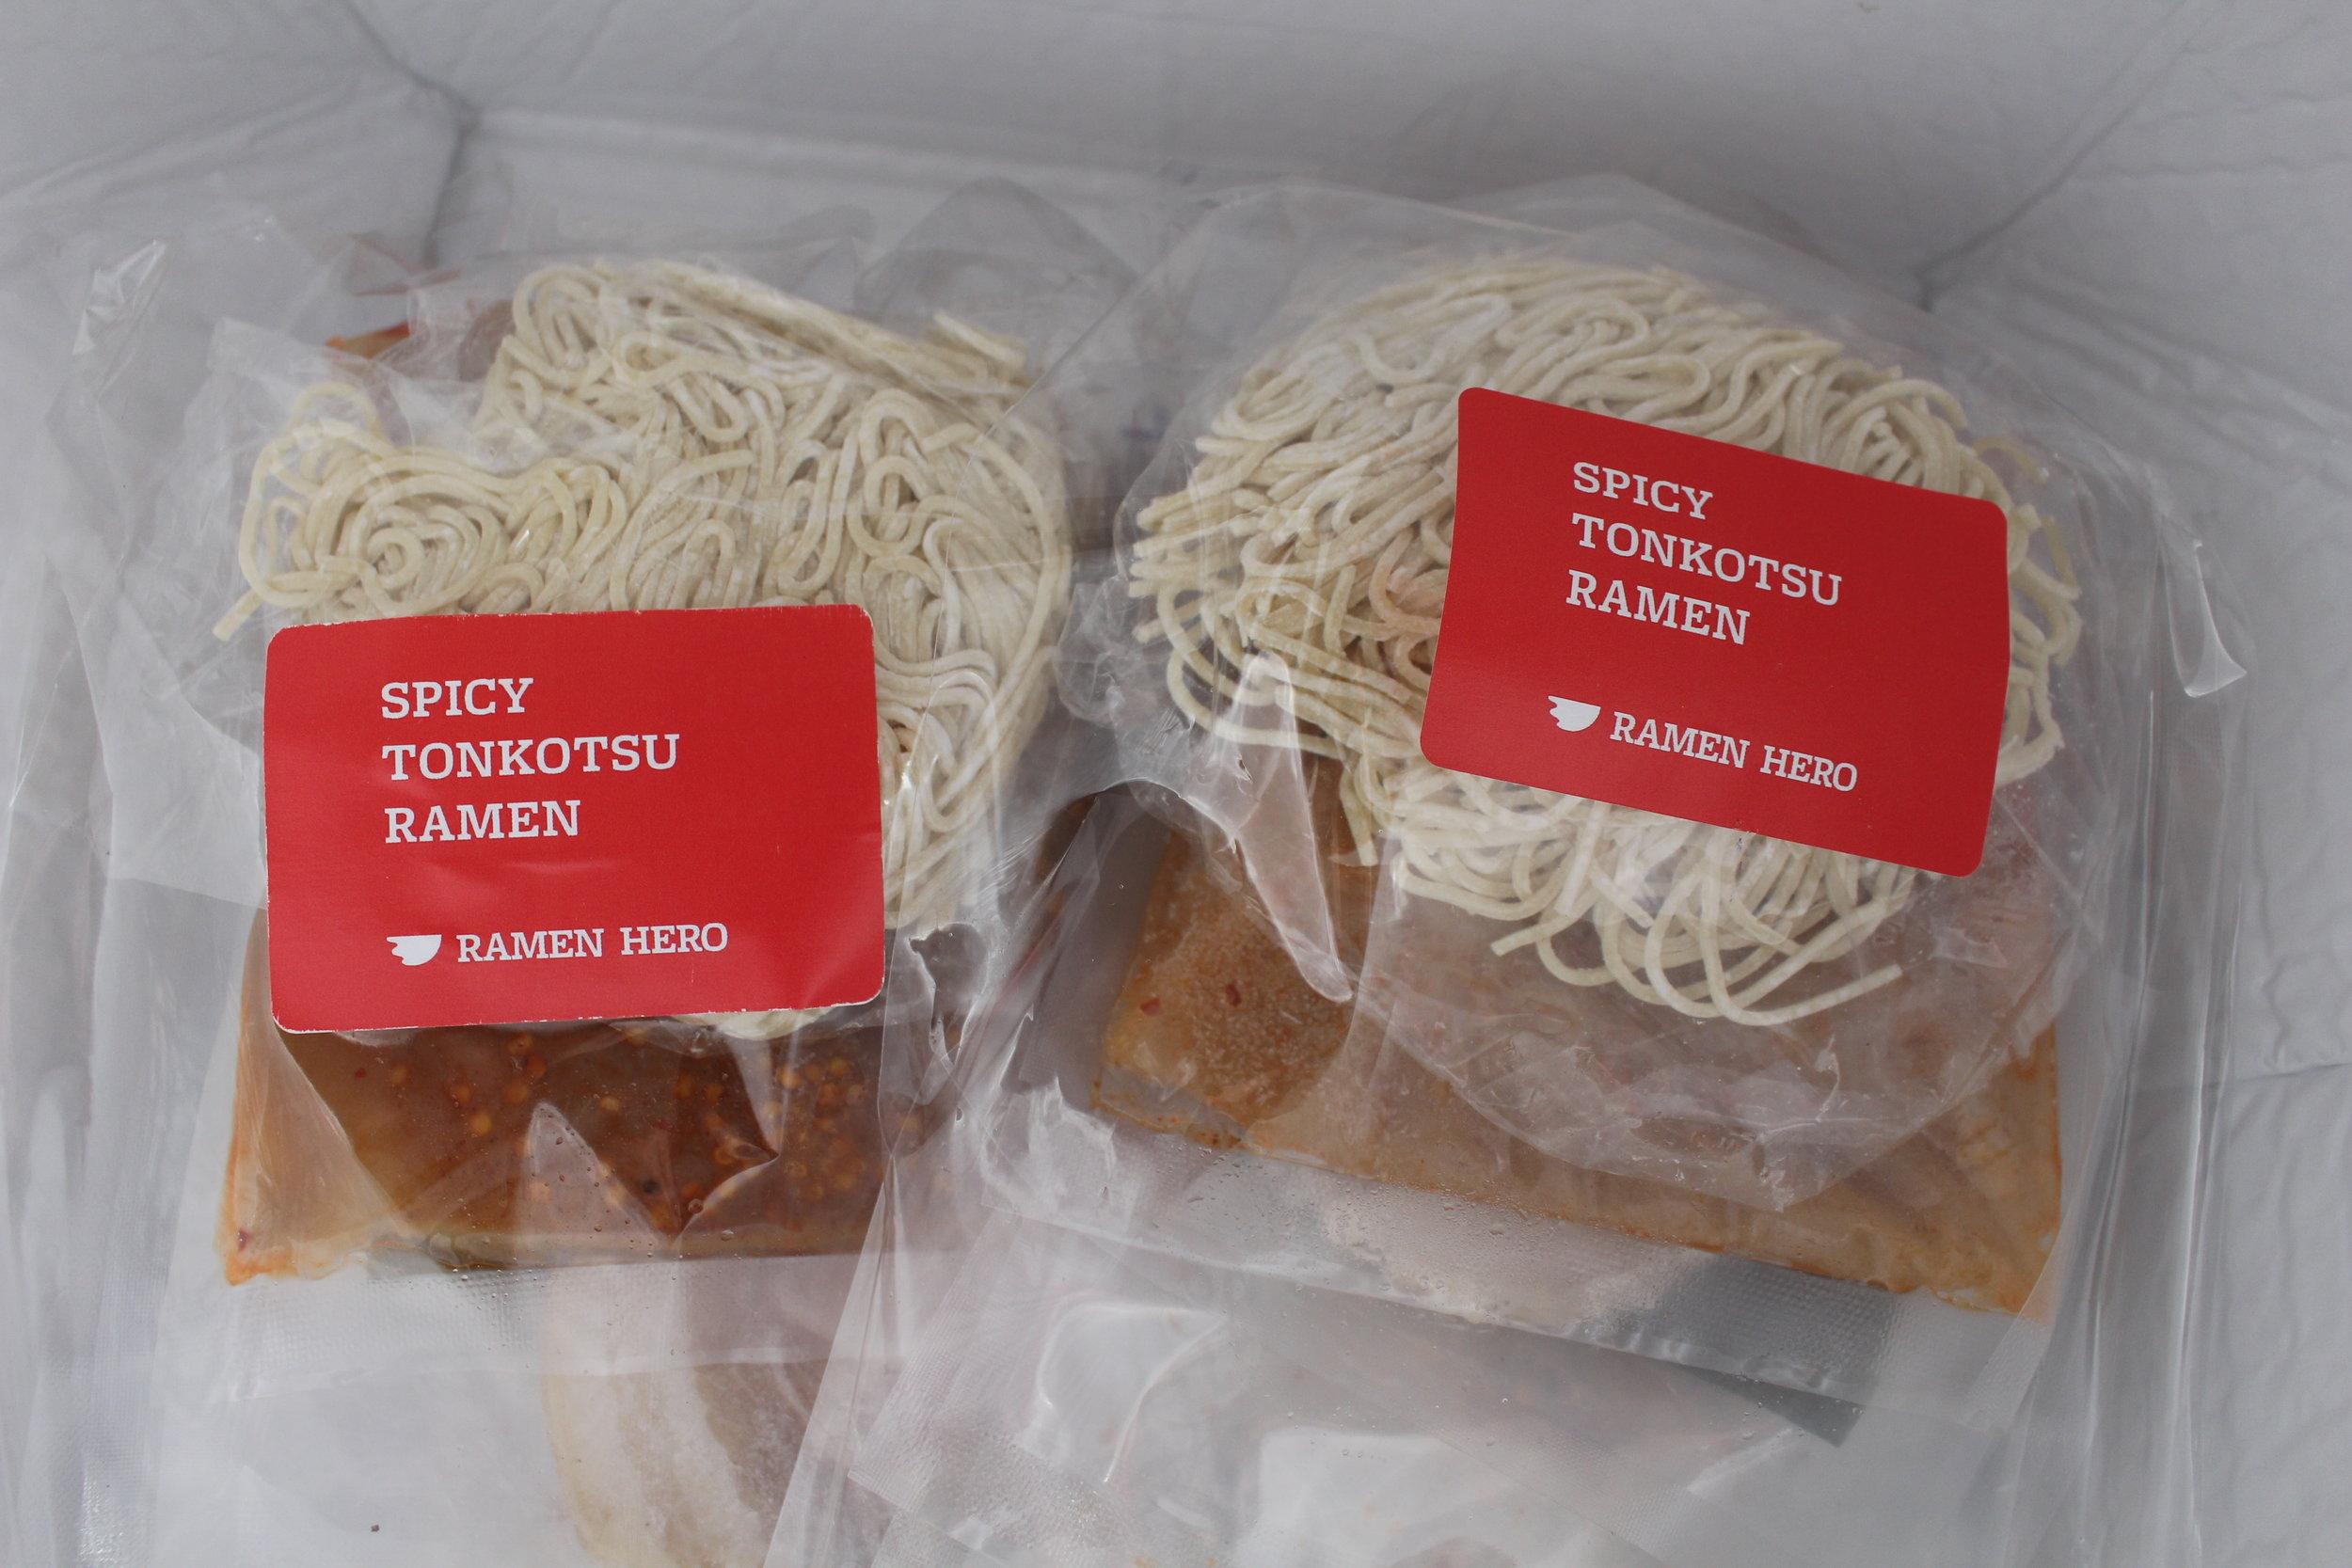 Spicy tonkotsu ramen kits (TP).